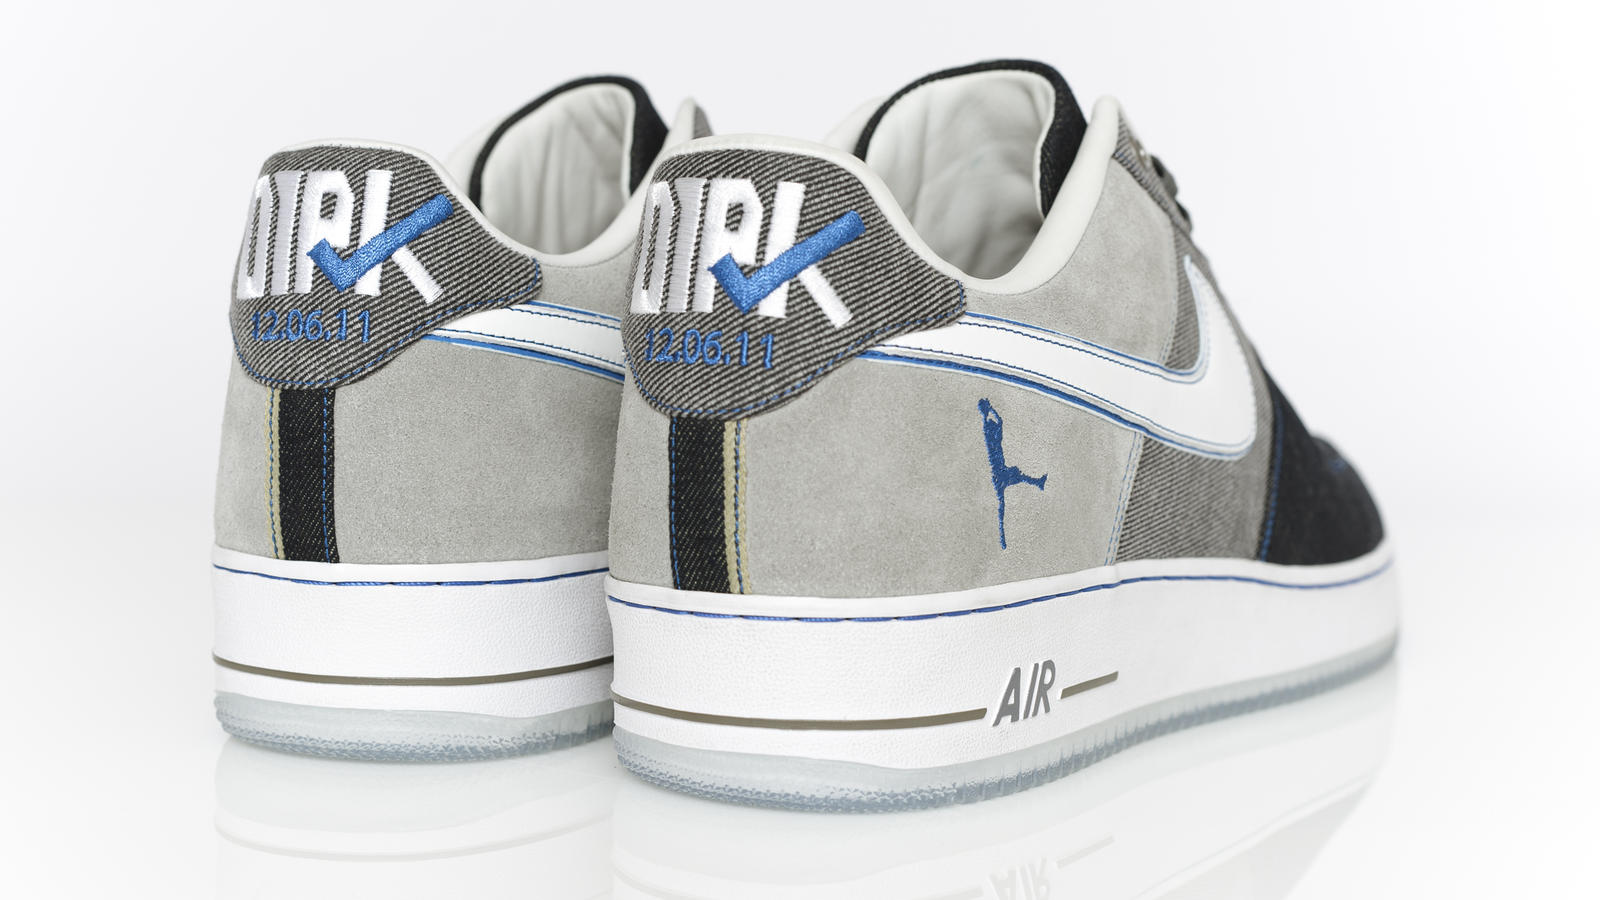 NIKE DESIGNS BESPOKE AIR FORCE 1 FOR DIRK NOWITZKI Nike News